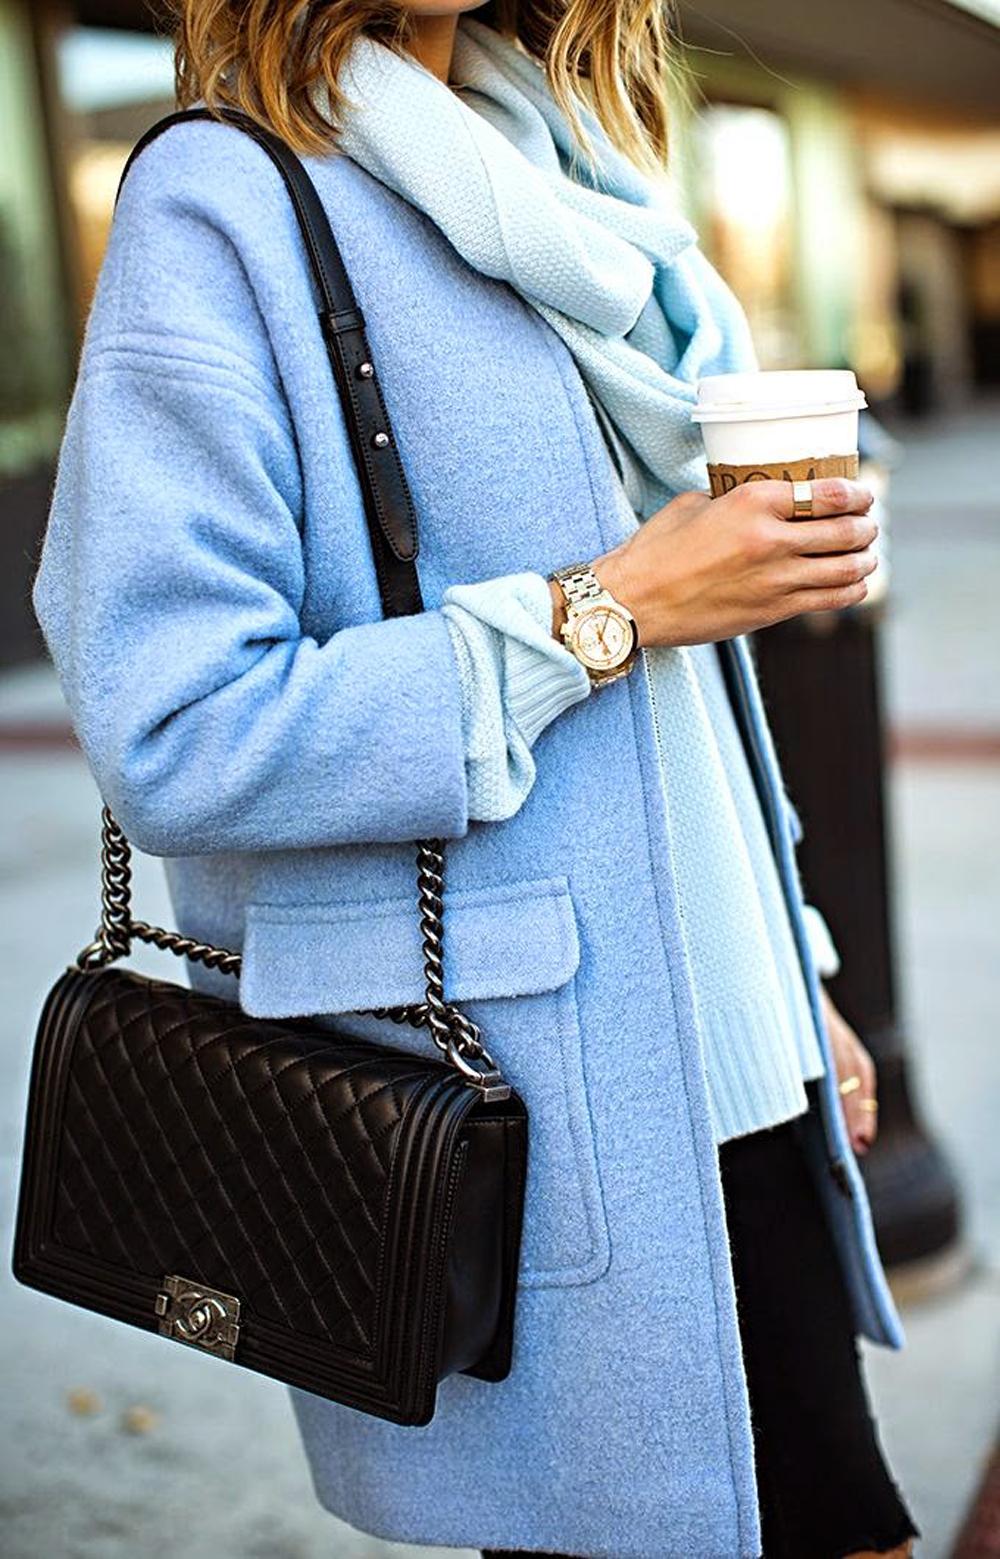 chanel 2.55 jumbo | outfit borsa chanel